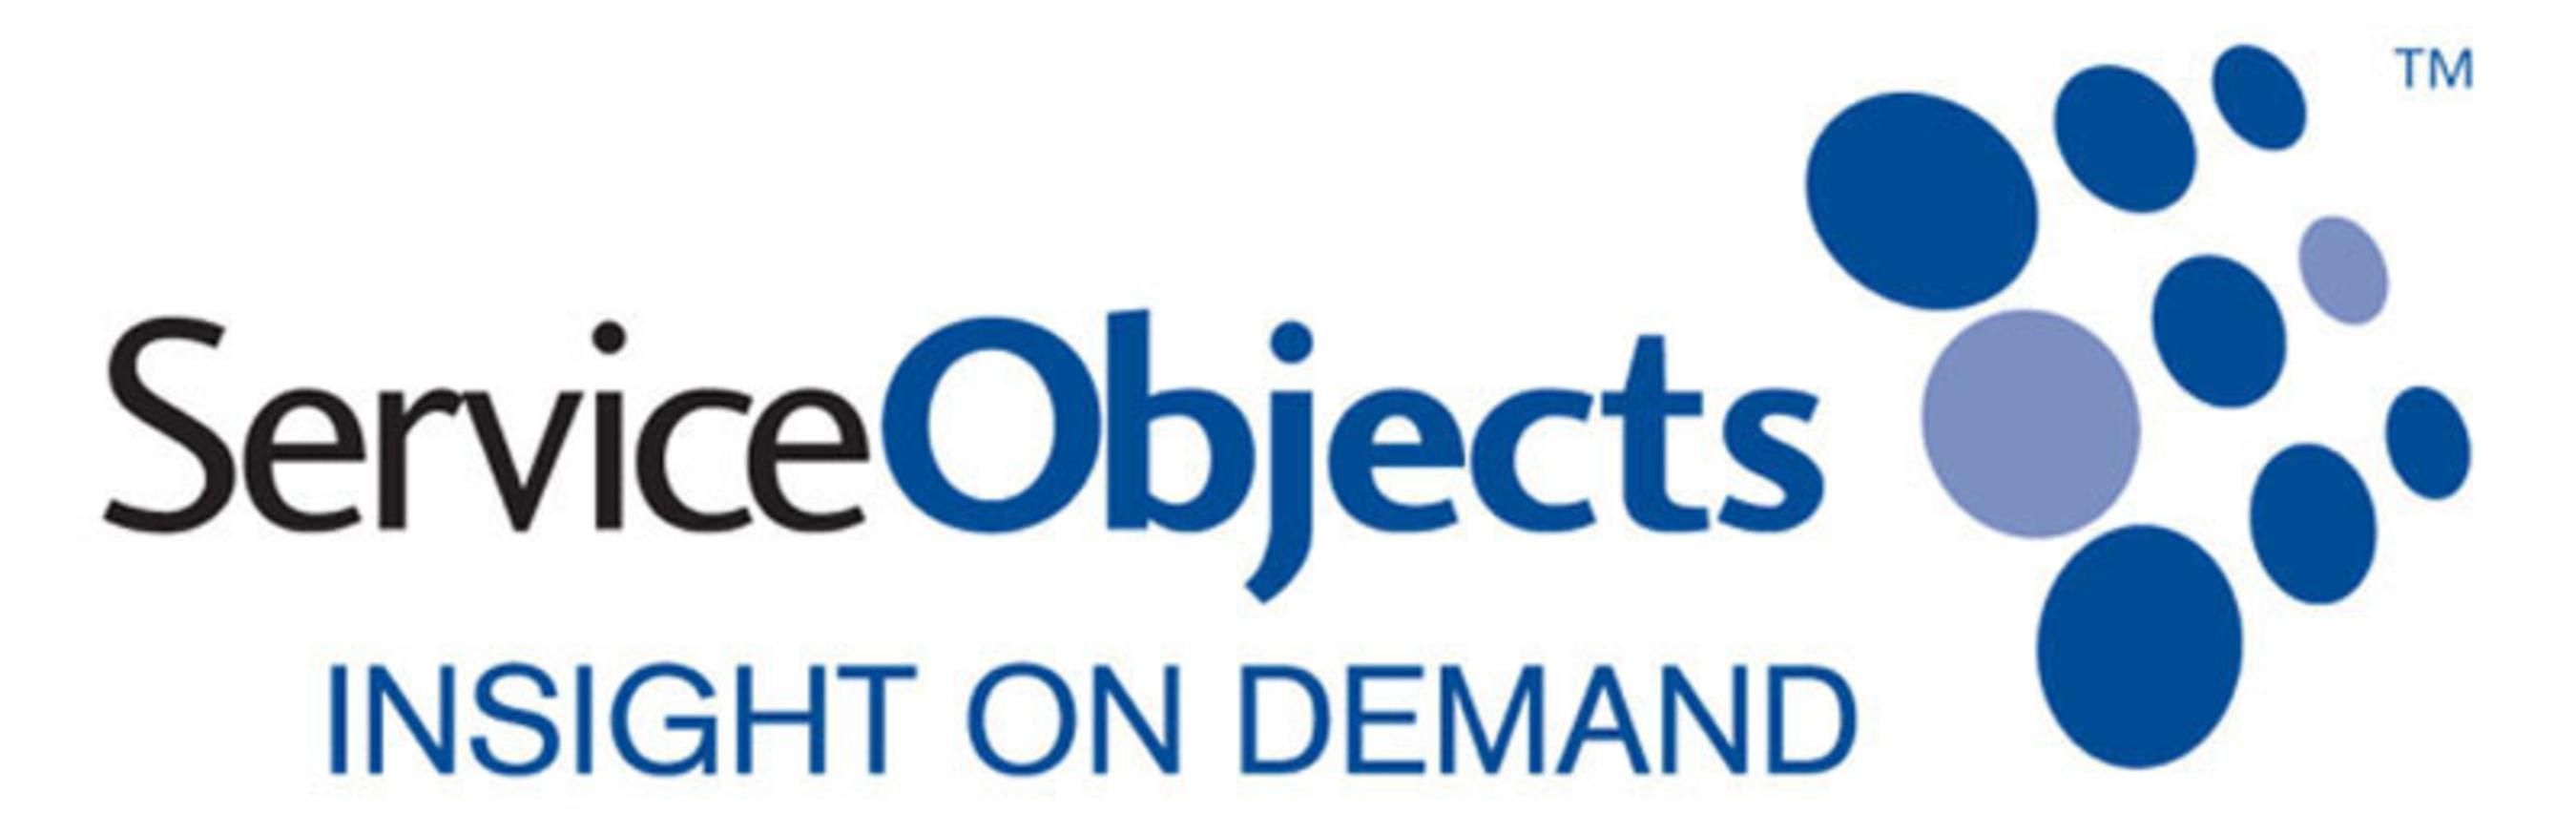 Service Objects Logo. (PRNewsFoto/Service Objects) (PRNewsFoto/SERVICE OBJECTS)